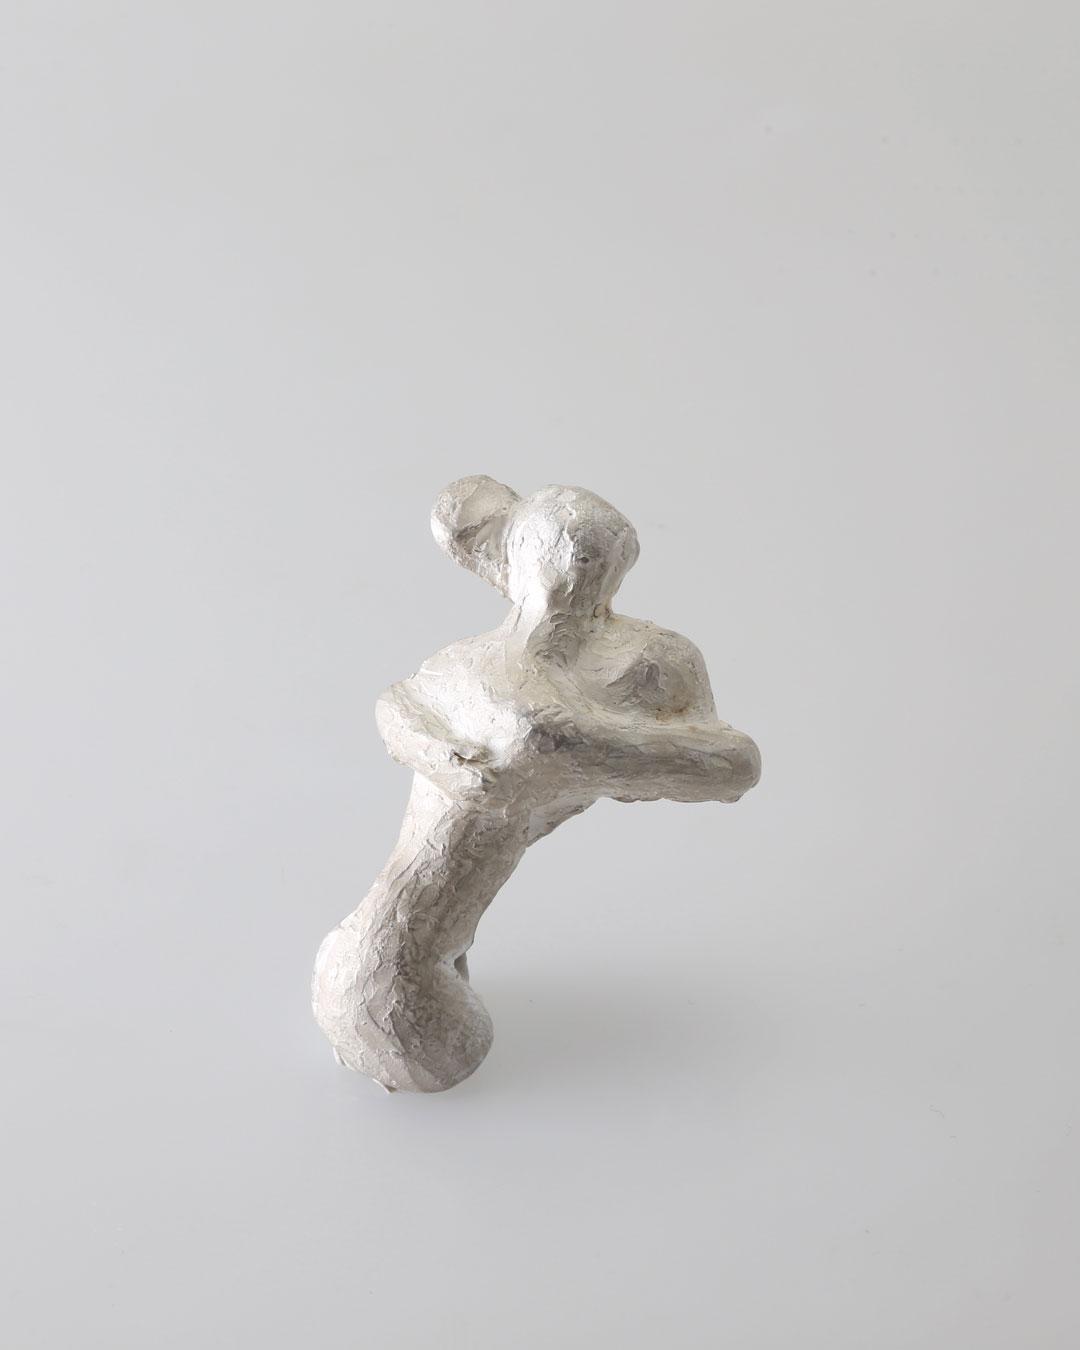 Juliane Brandes, zonder titel, 2016, broche; zilver, 60 x 40 x 15 mm, €1460